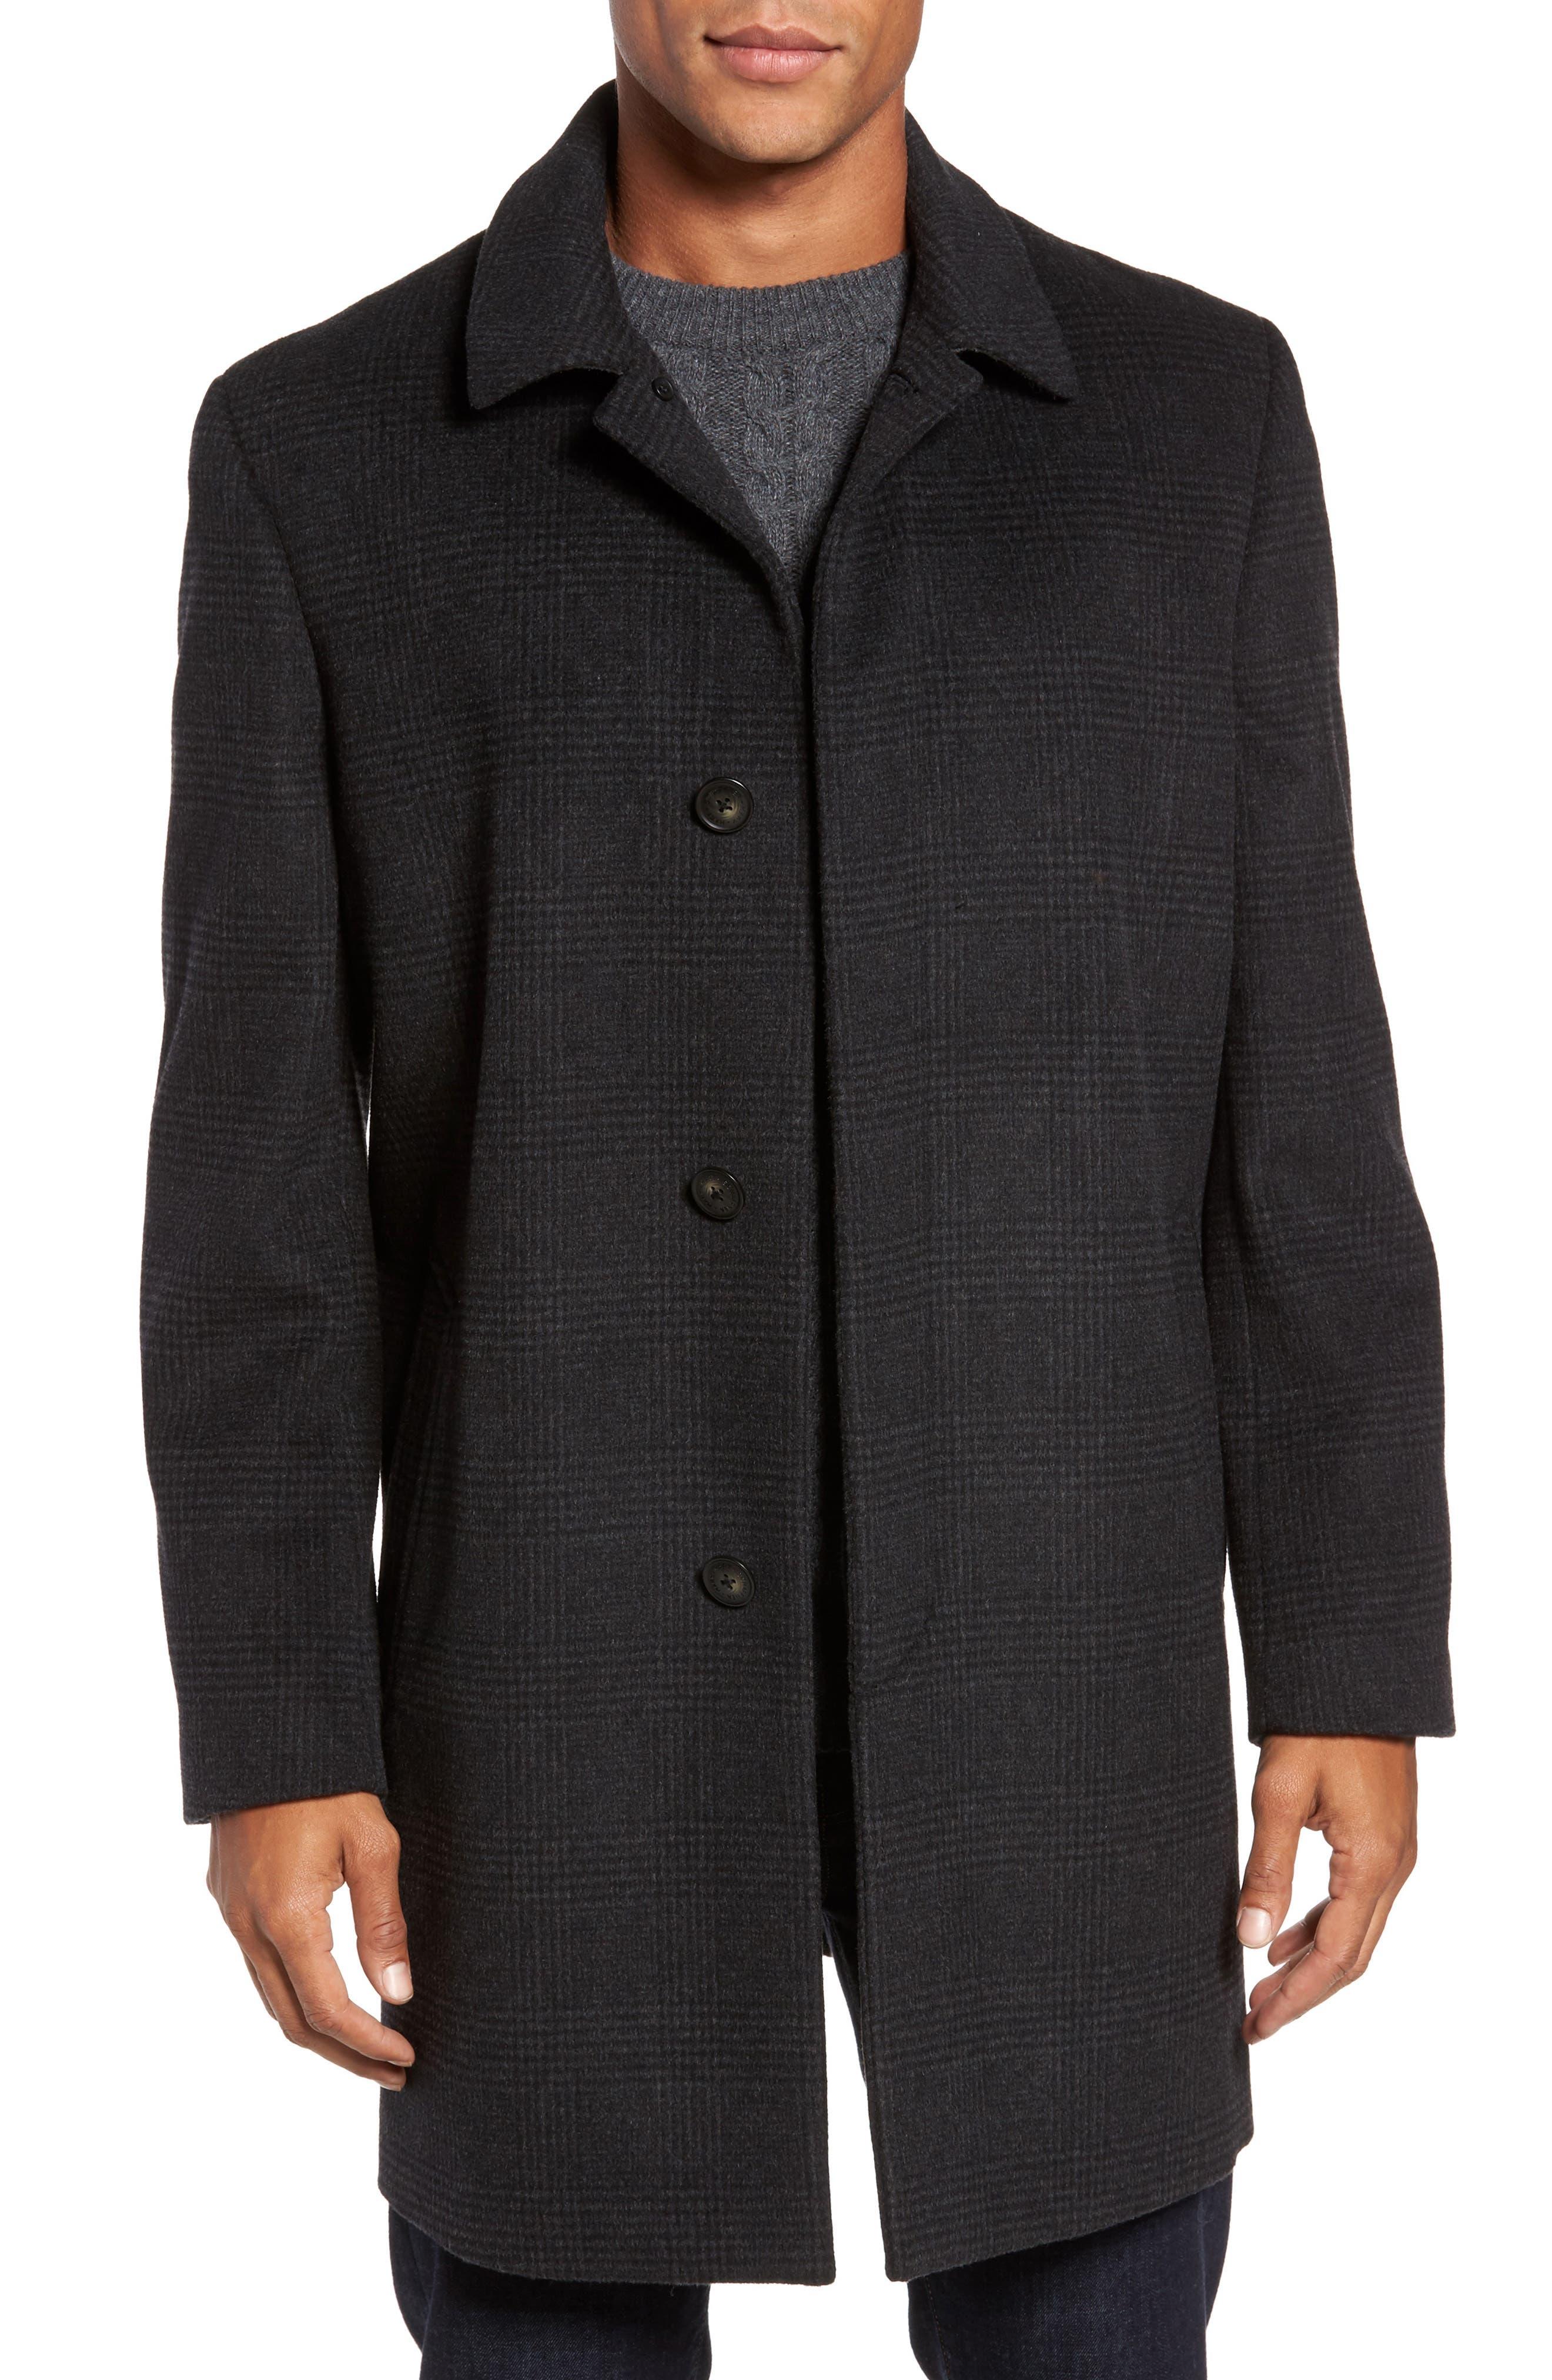 Turner Plaid Wool Blend Topcoat,                             Main thumbnail 1, color,                             Dark Charcoal